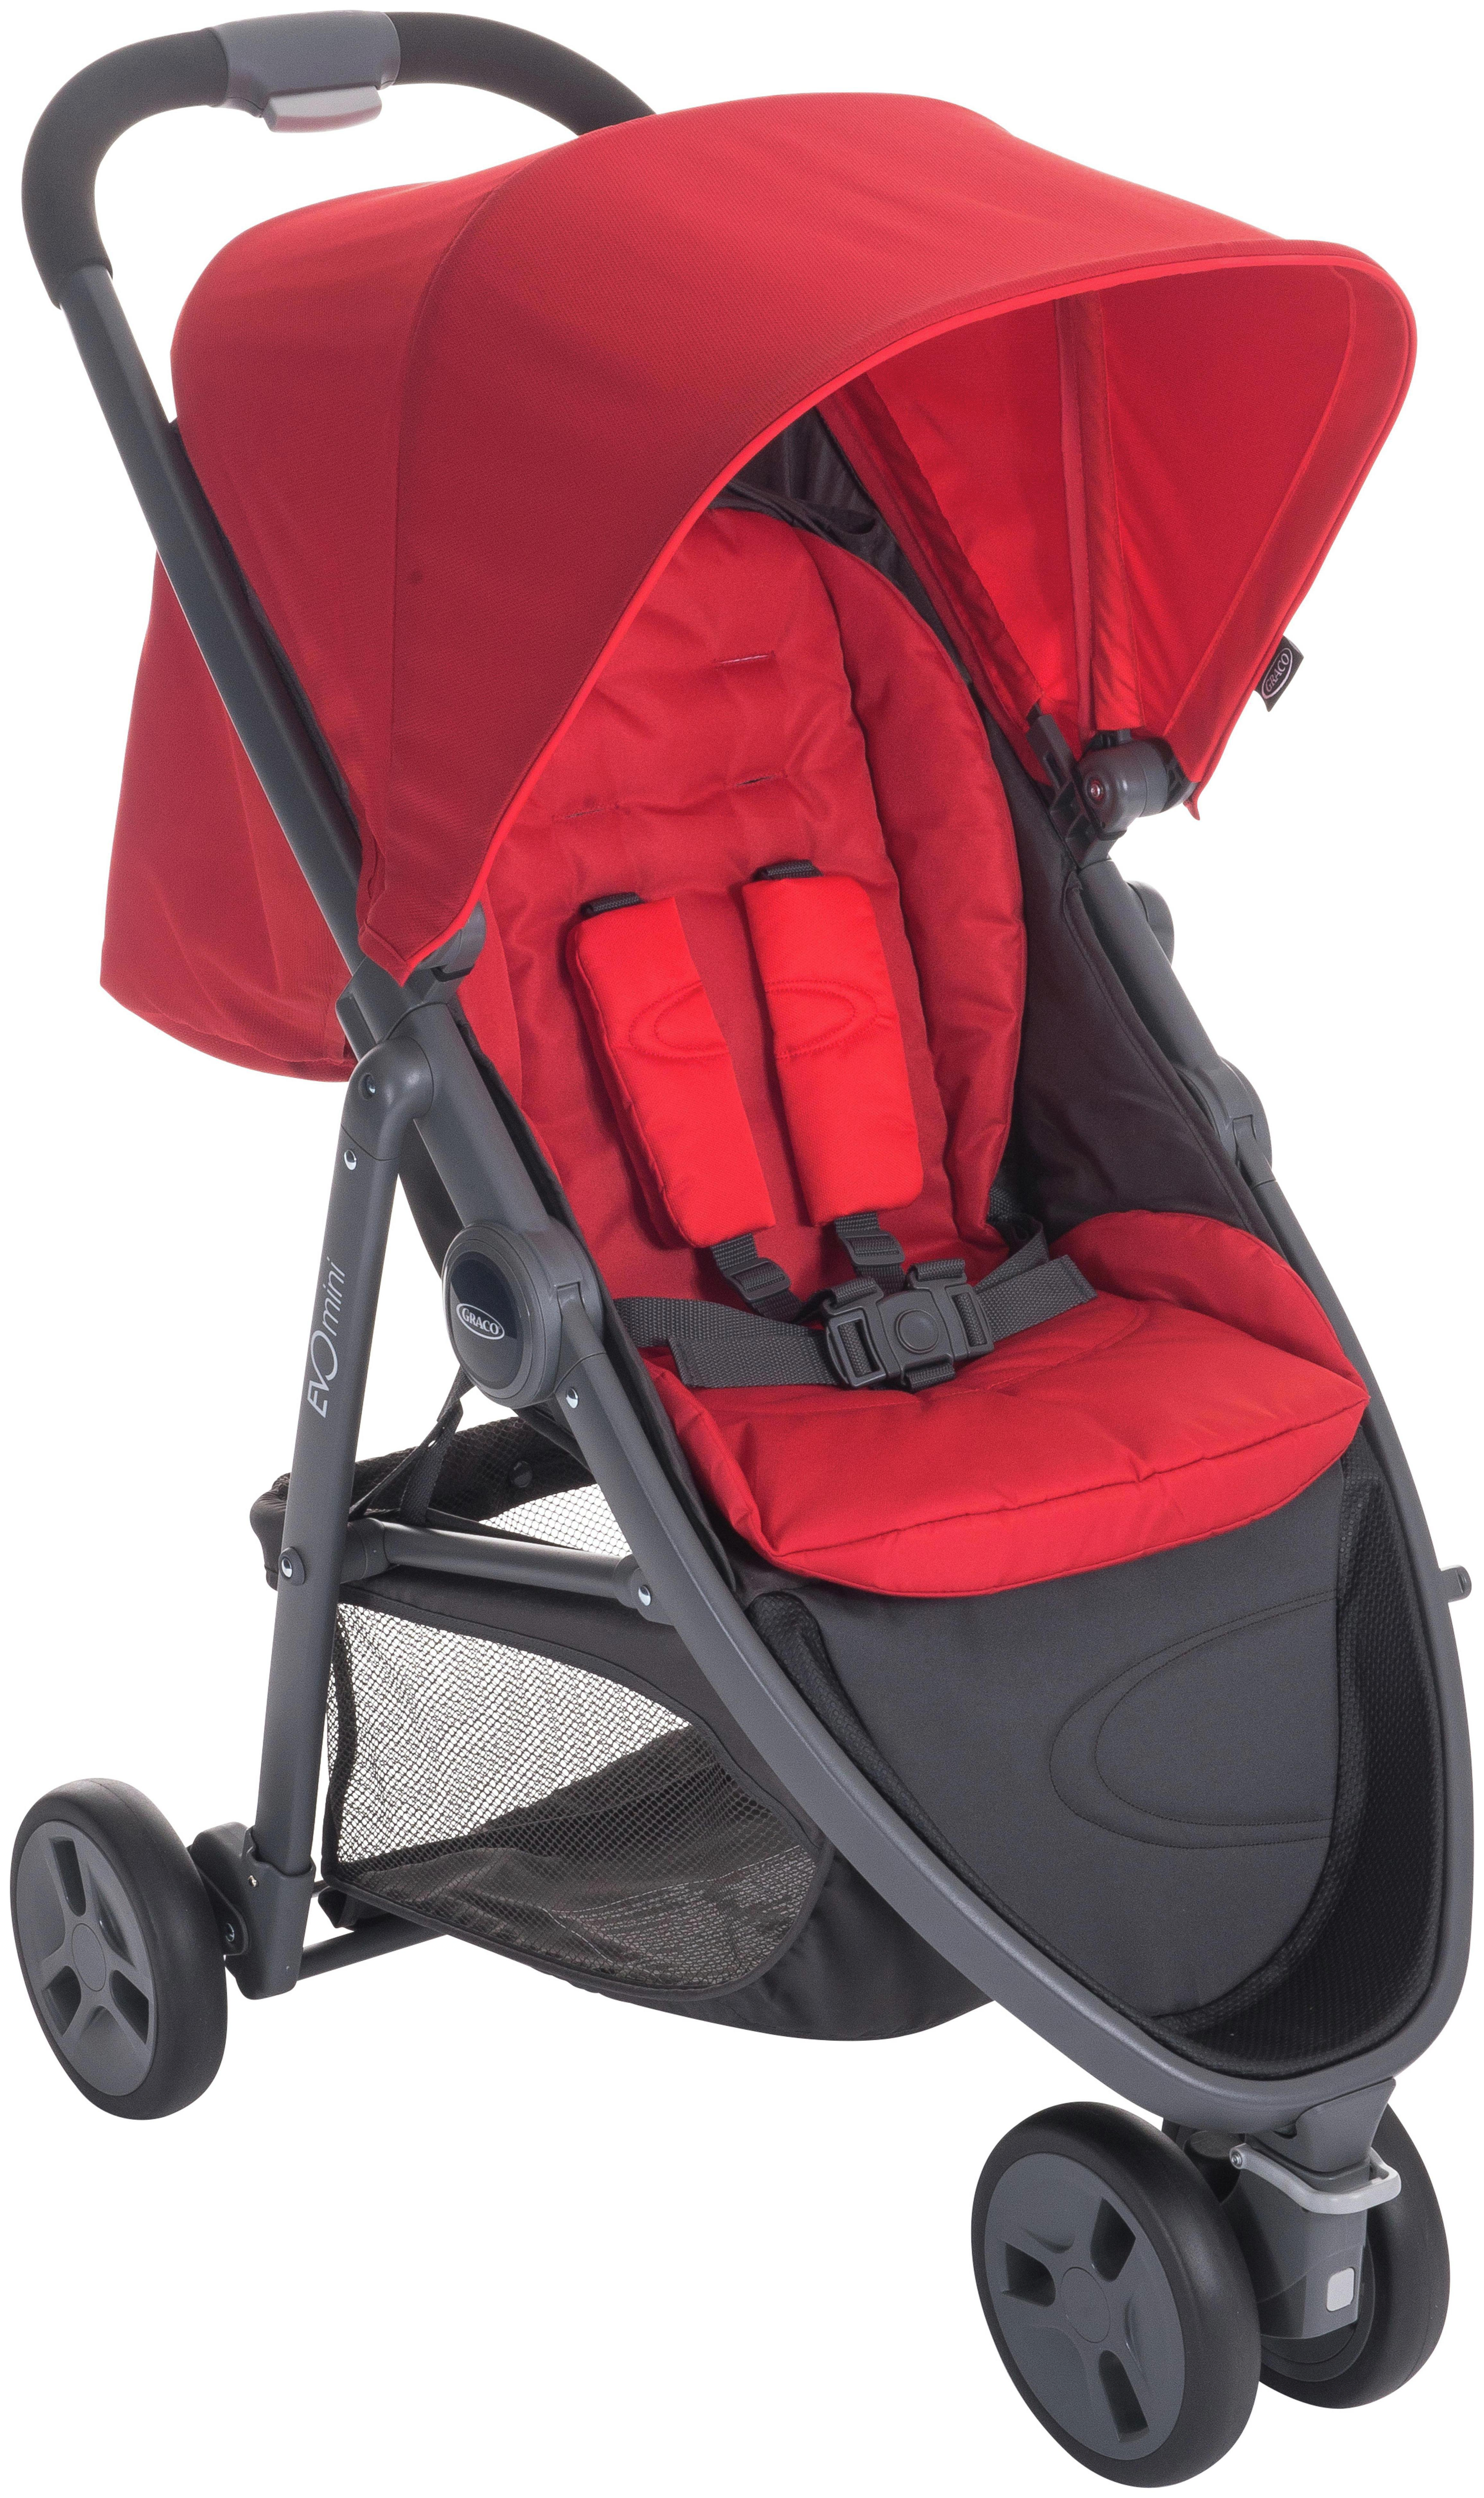 'Graco Evo Fiery Red Mini Pushchair.